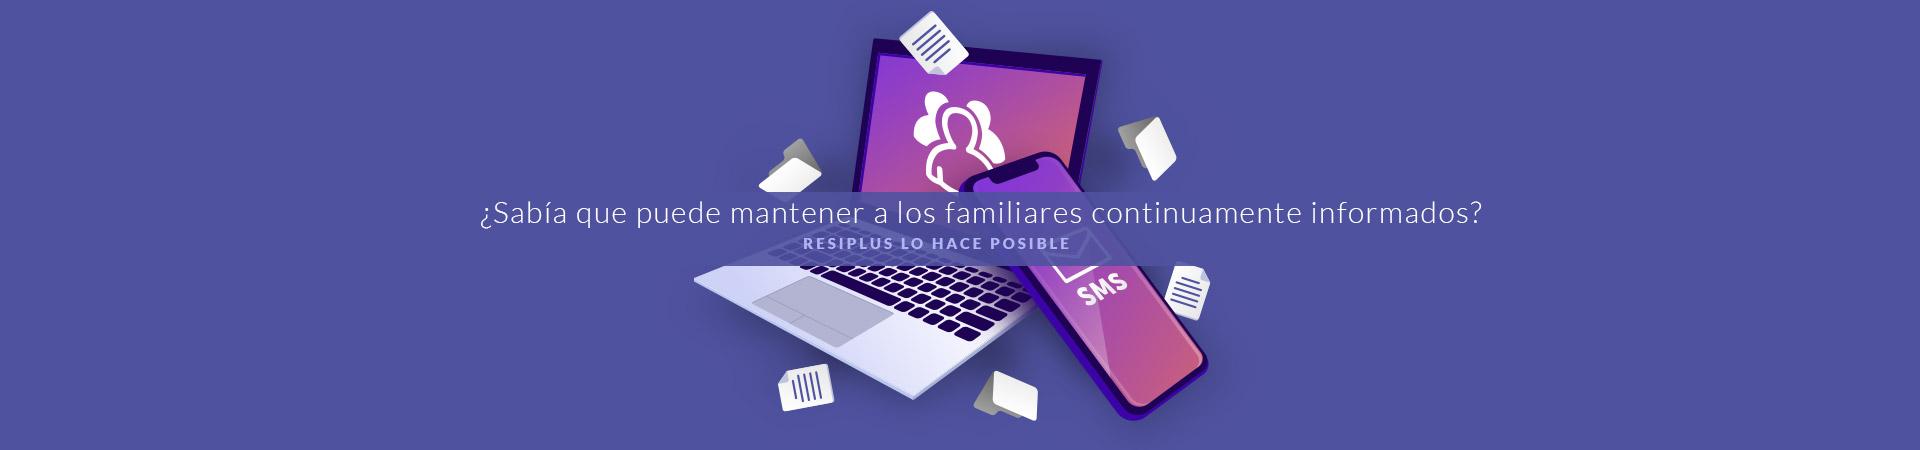 Slide-familiares-informados